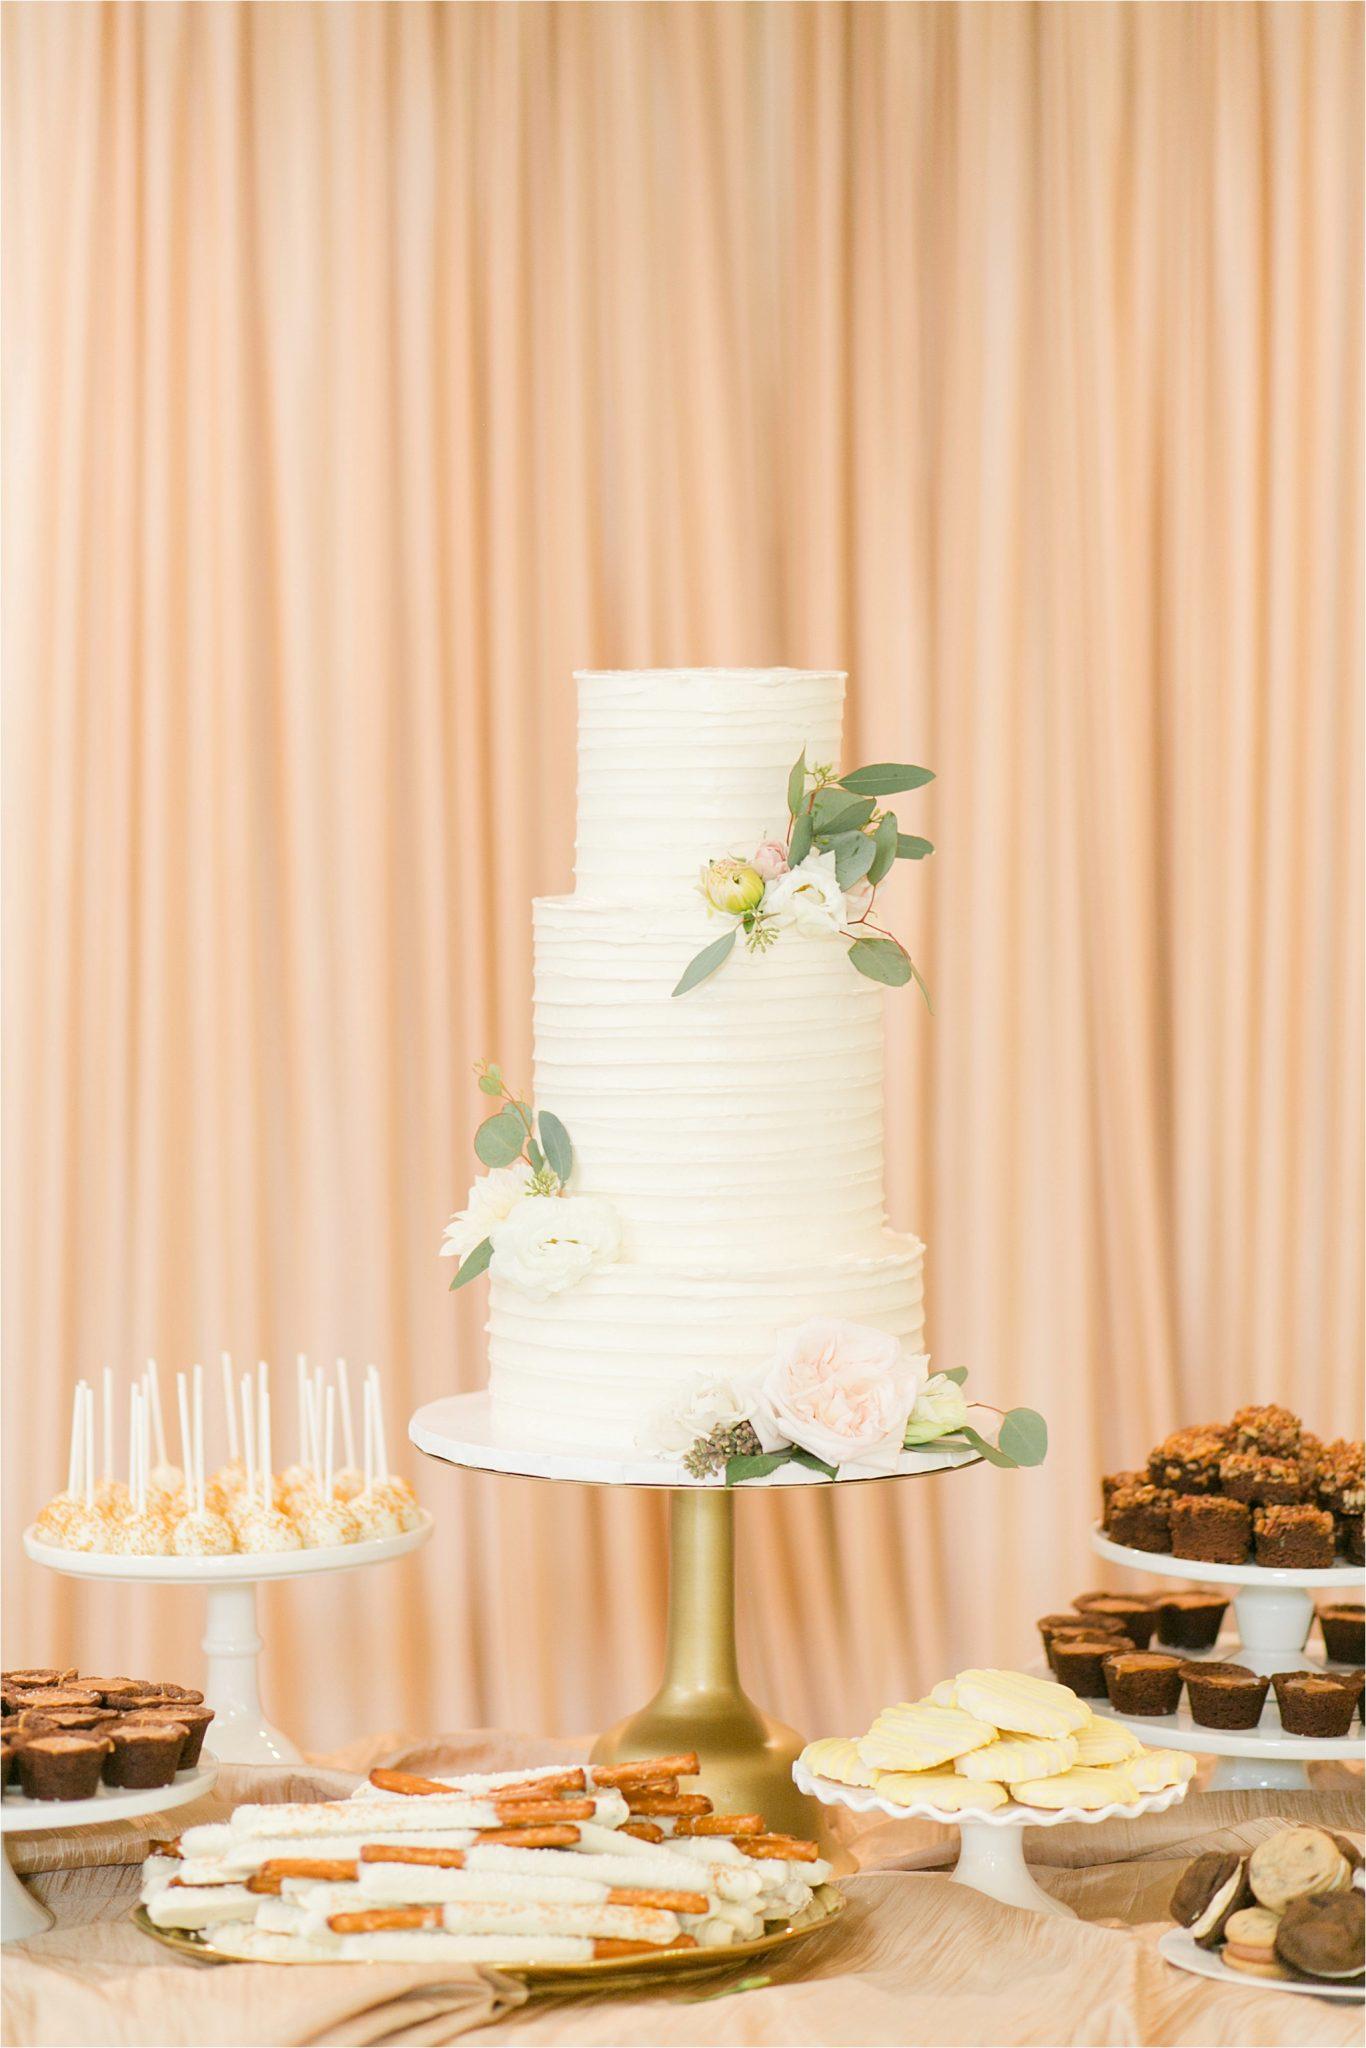 wedding cake-EllenJay Dessert Bar-dessert table-wedding-reception-3 tier wedding cakes